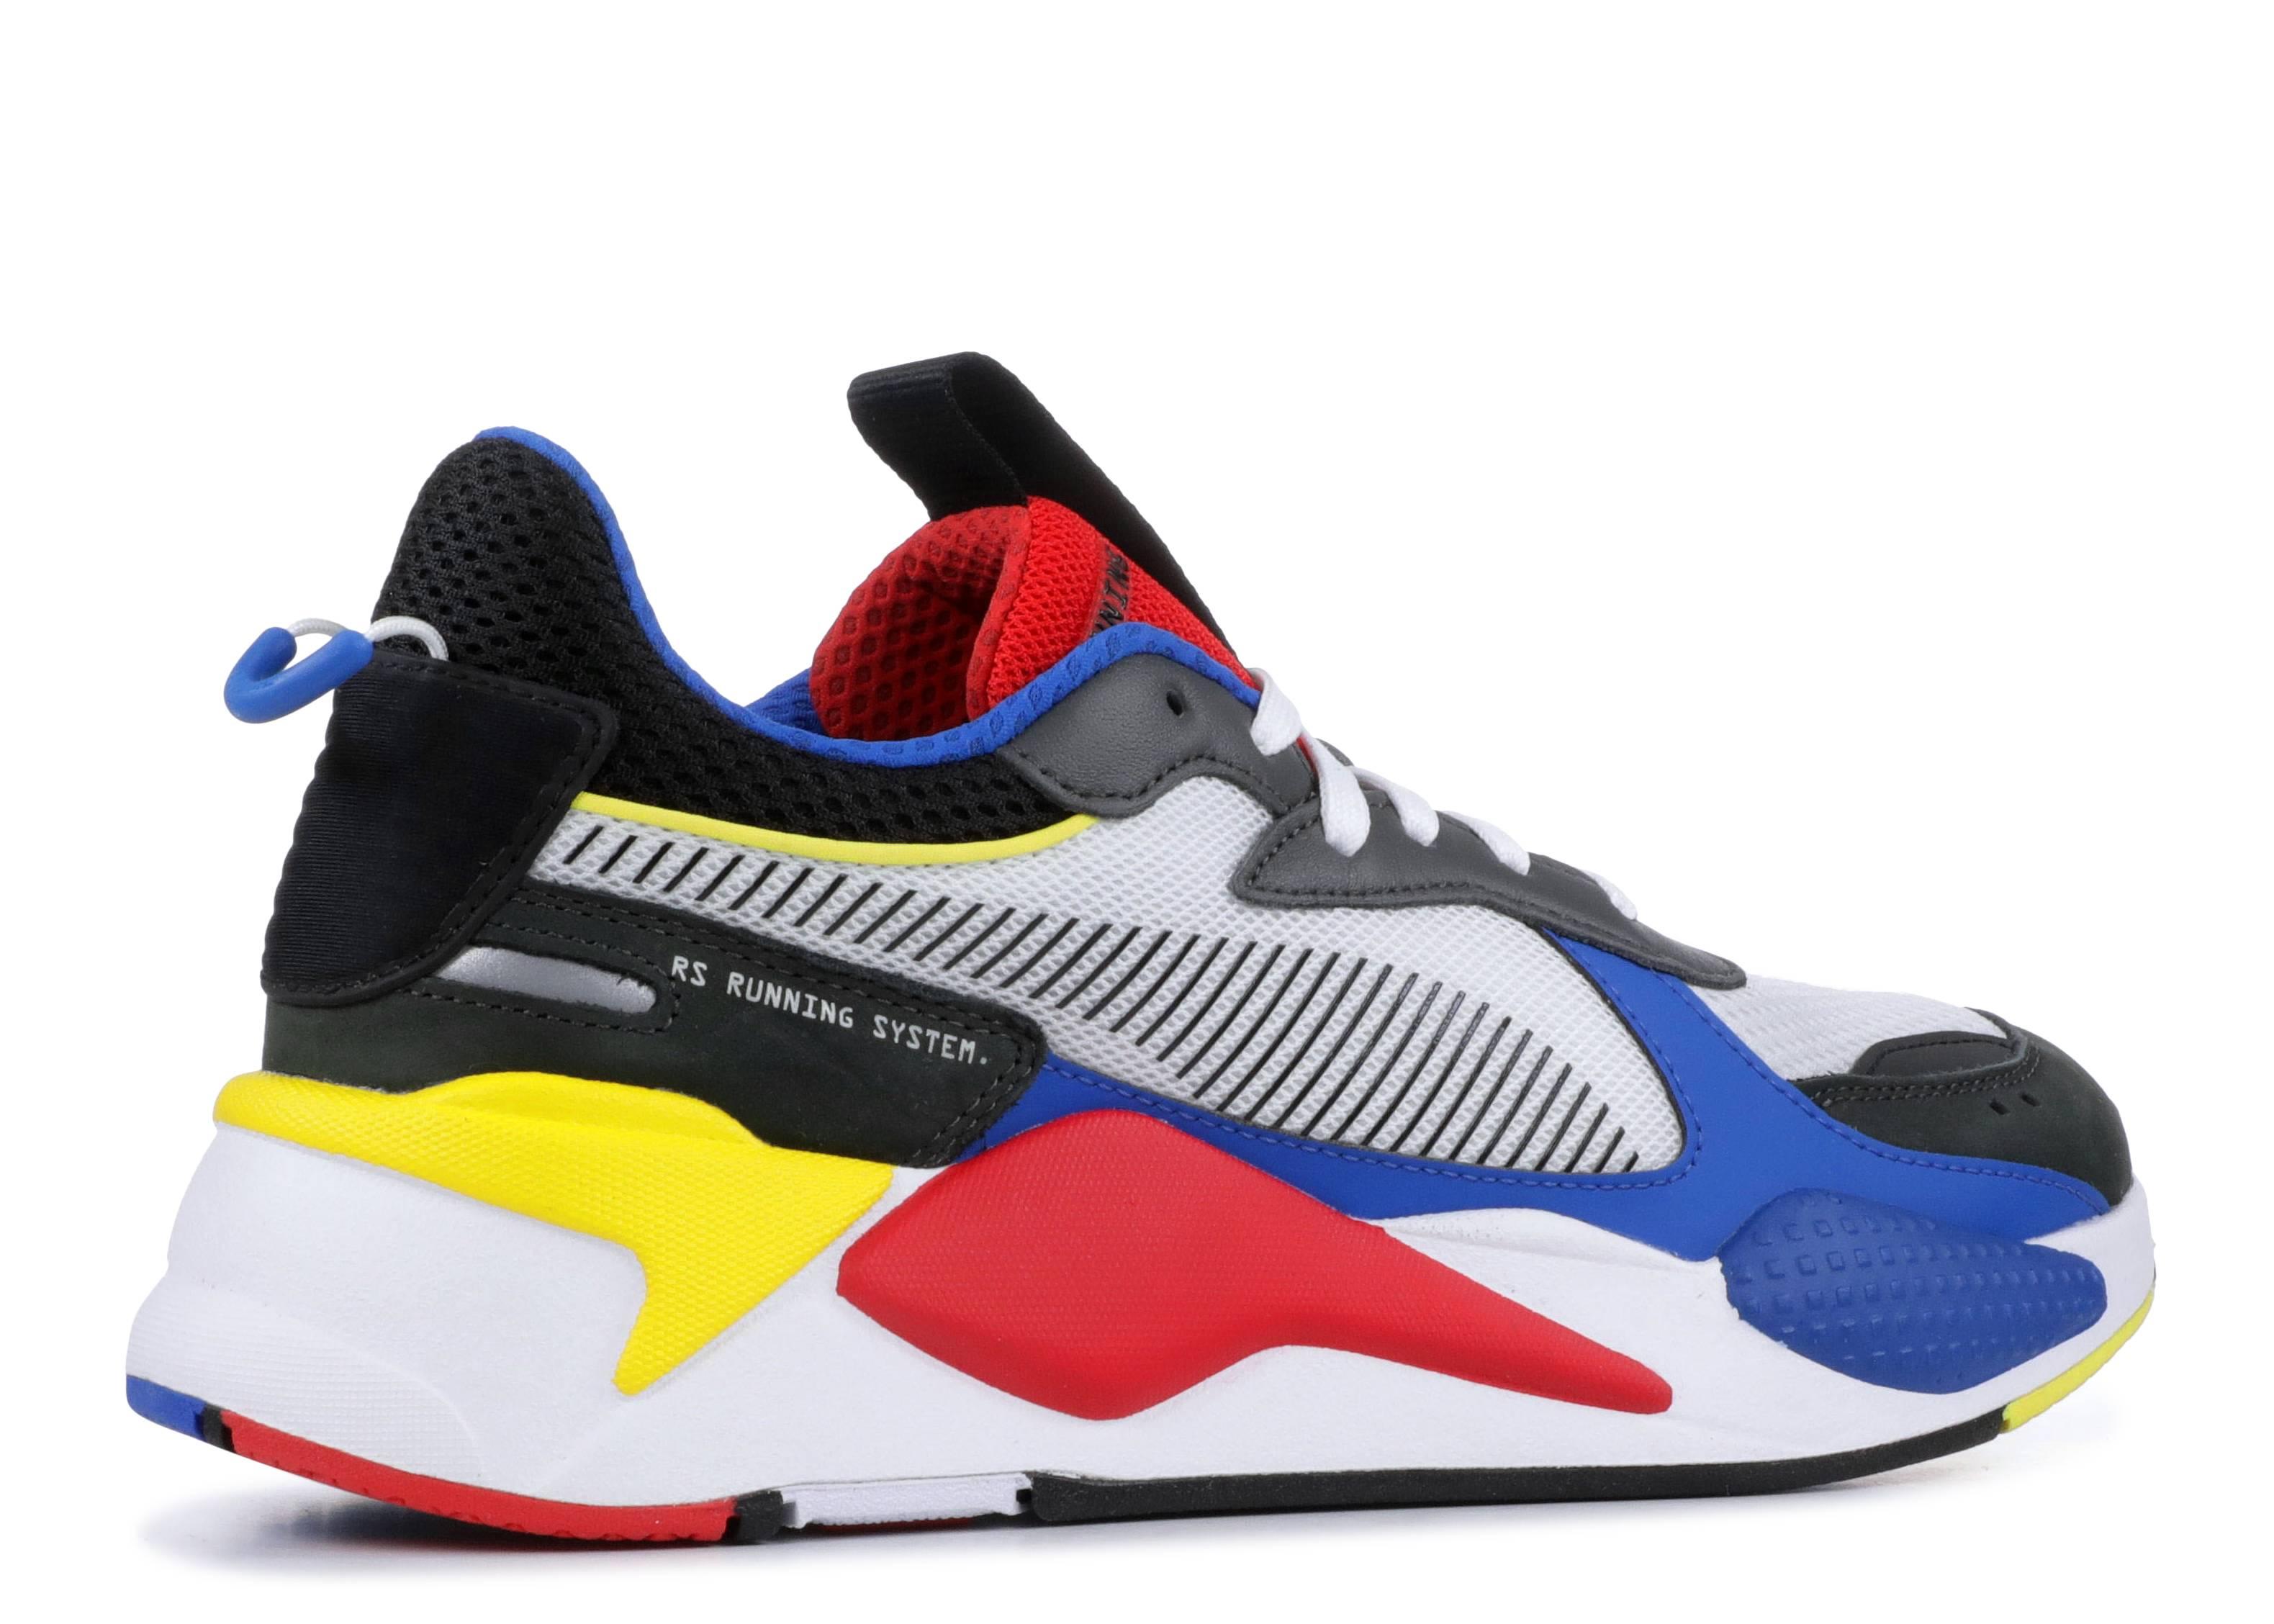 1d39d577c6b6 Rs-x Toys - Puma - 369449 02 - puma white-puma royal